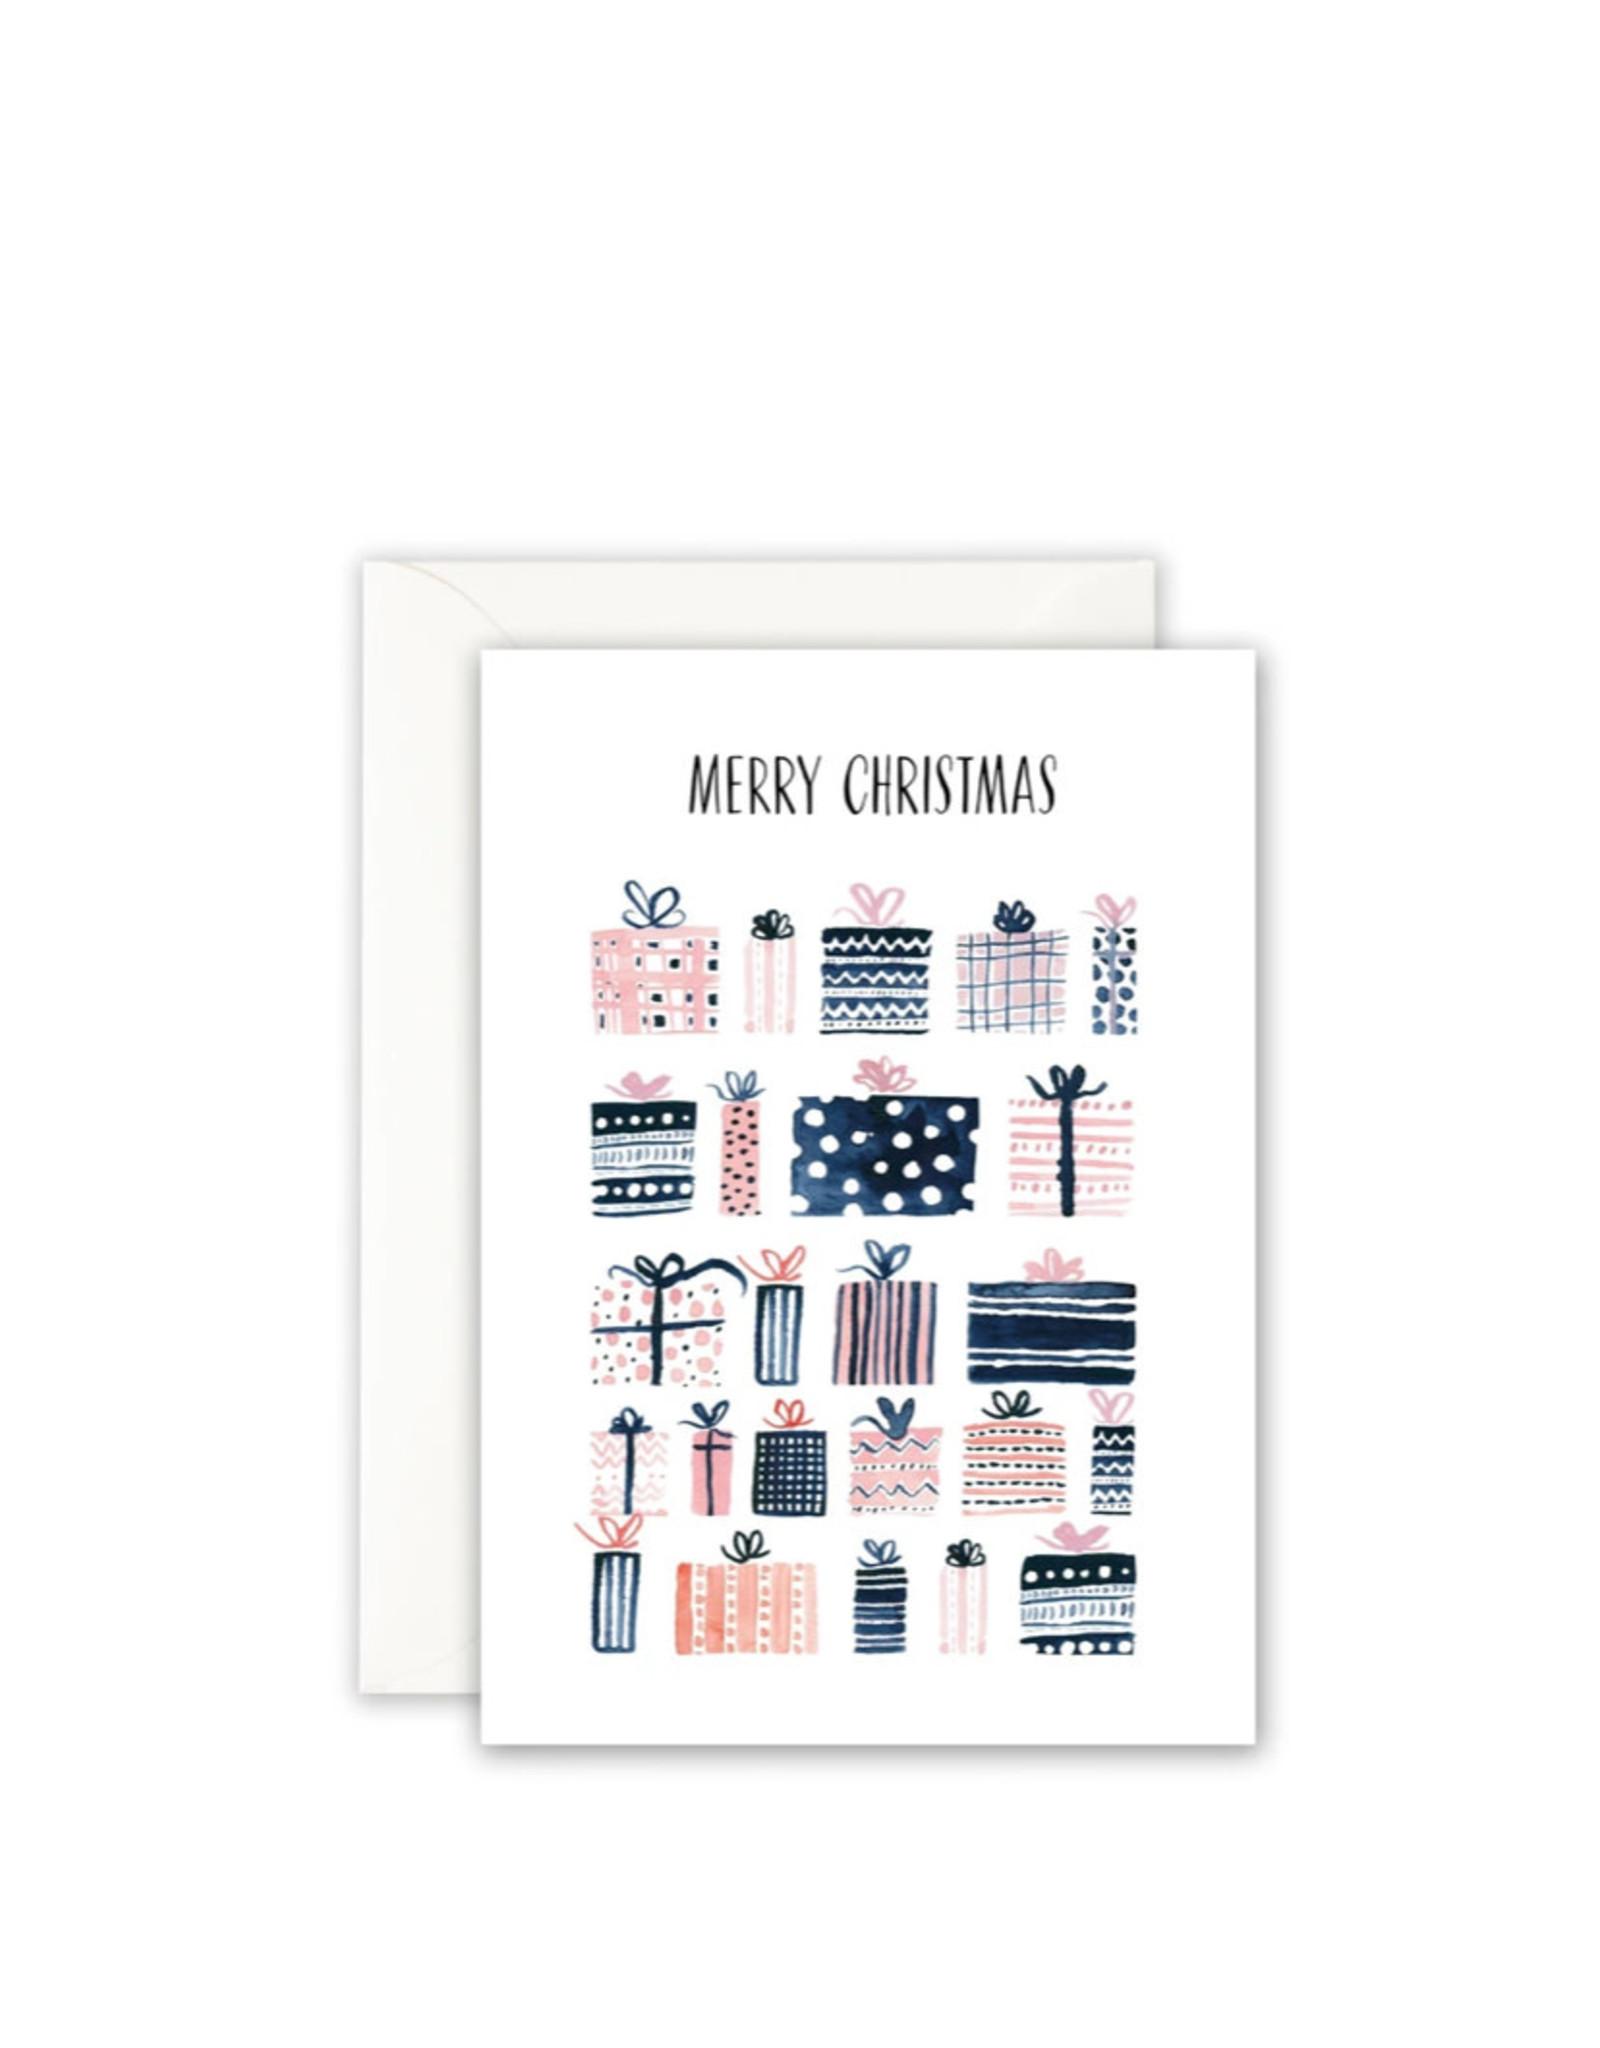 Leo La Douce Wenskaart - Kerst - Merry Christmas Gifts - Dubbele kaart + Envelope - 10 x 15cm